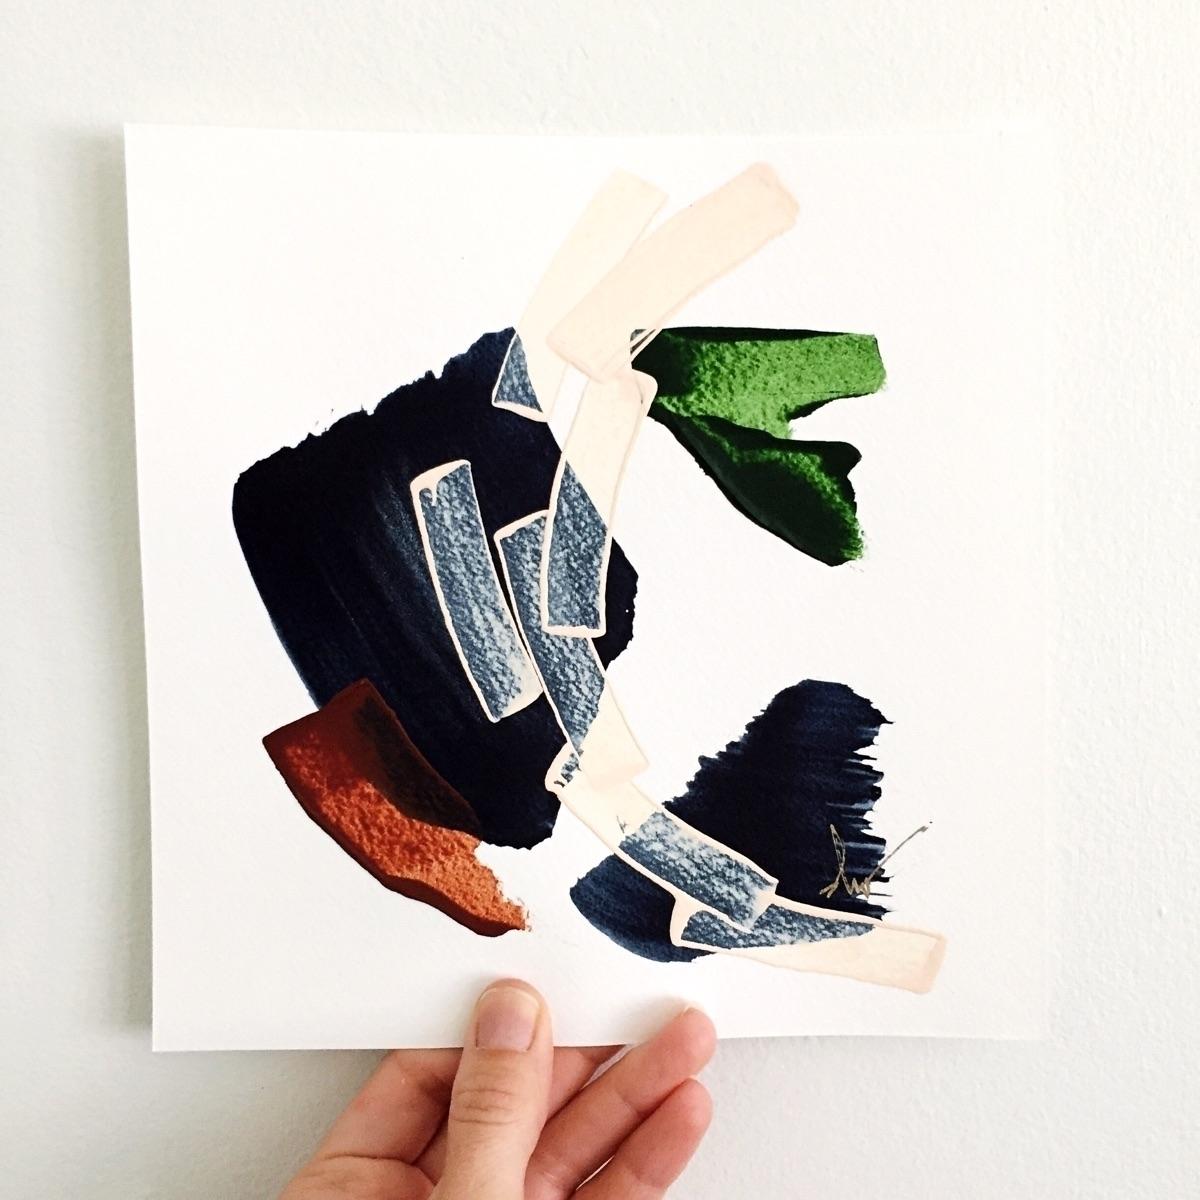 small experiments making pile.  - ebw_artwork | ello